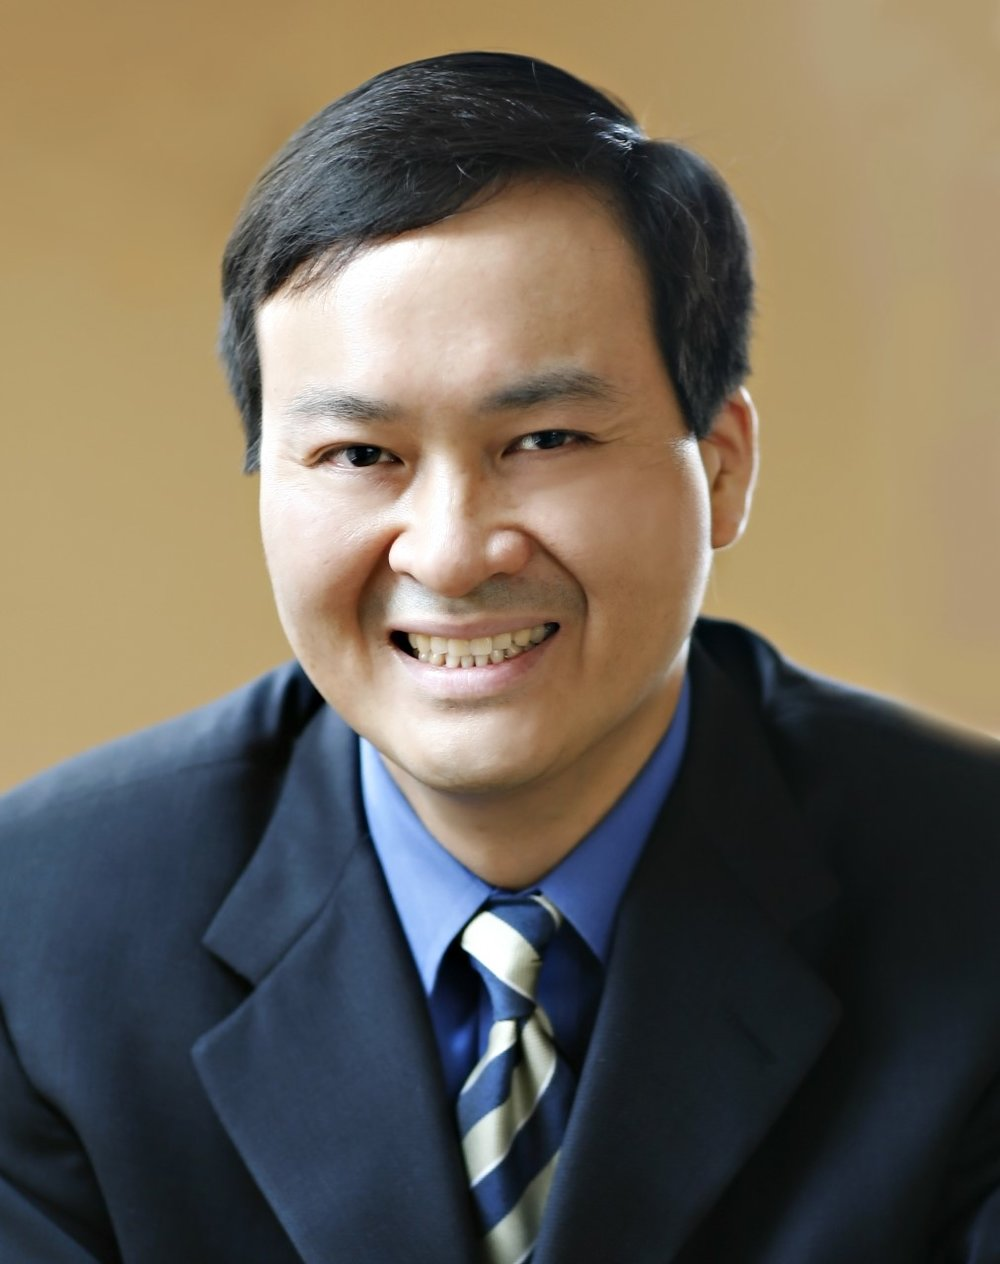 Dickson Cheung